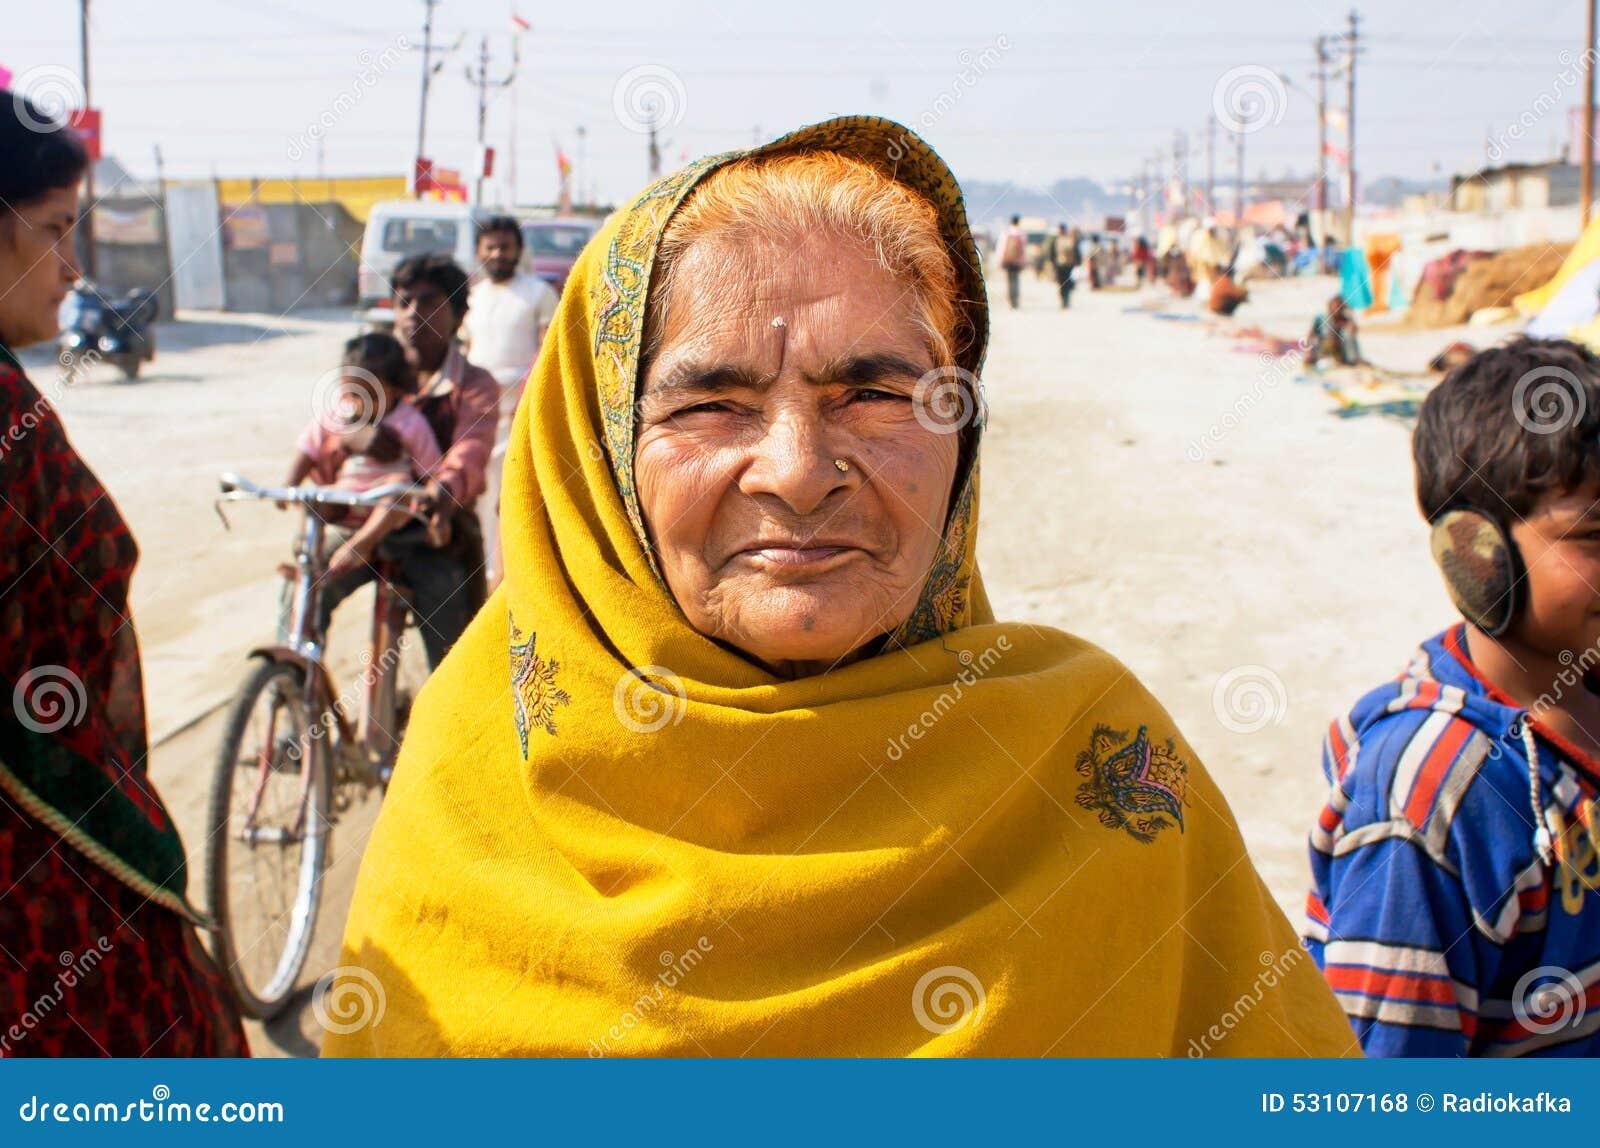 mulher-idosa-bonita-da-ndia-53107168.jpg